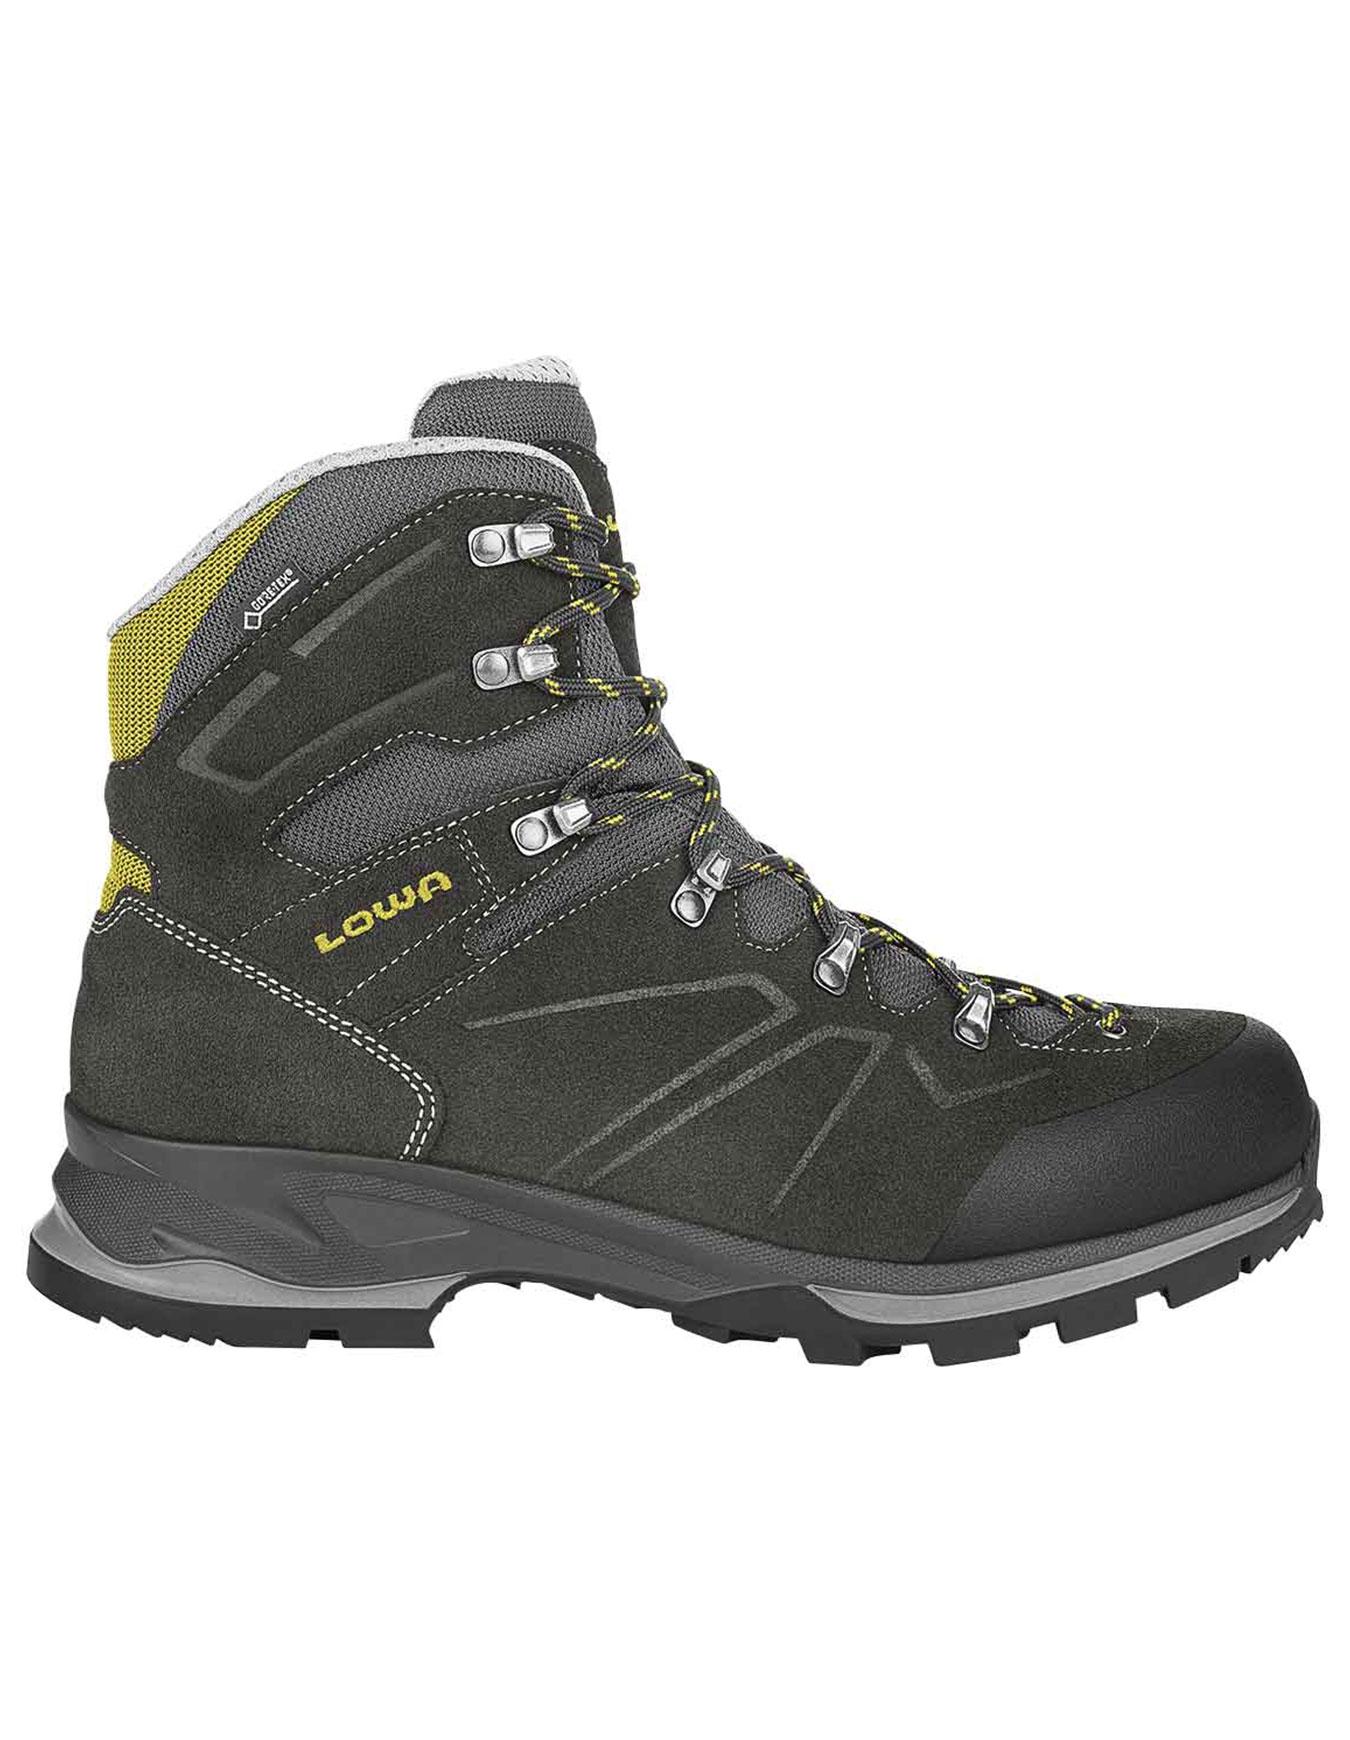 Baldo GTX anthracite/olive Lowa : Chaussures randonnée